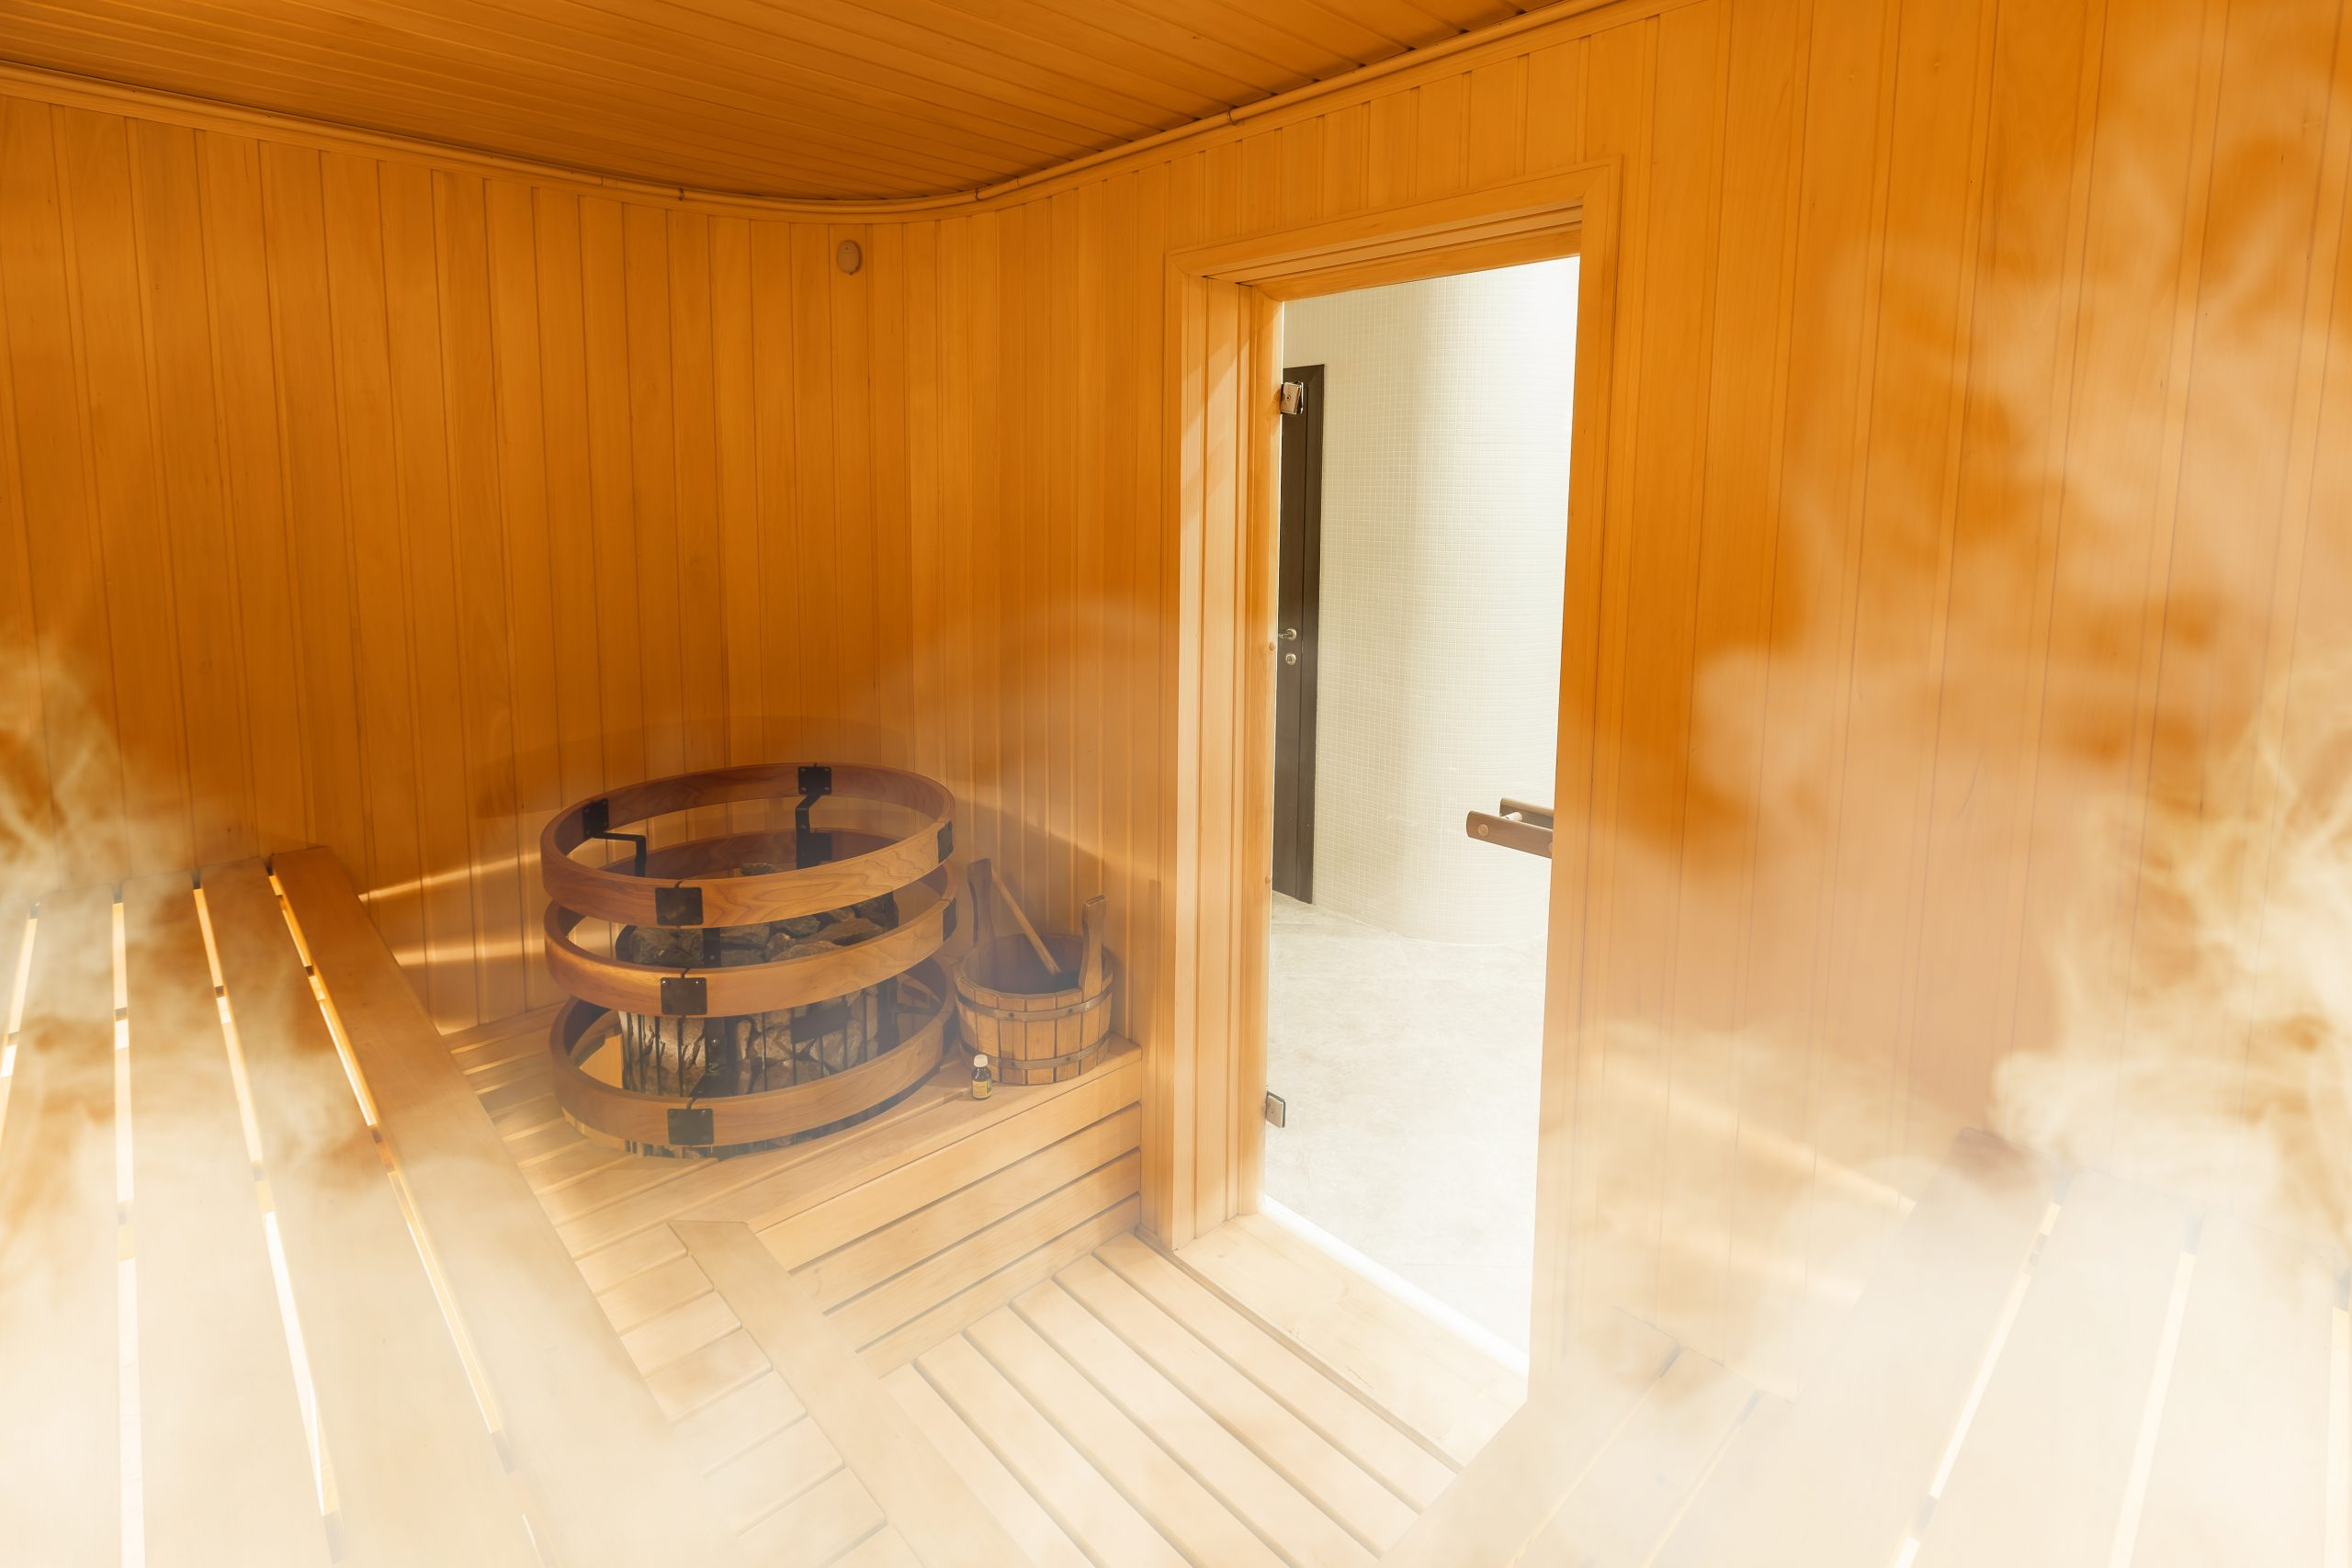 Which type of sauna is best?